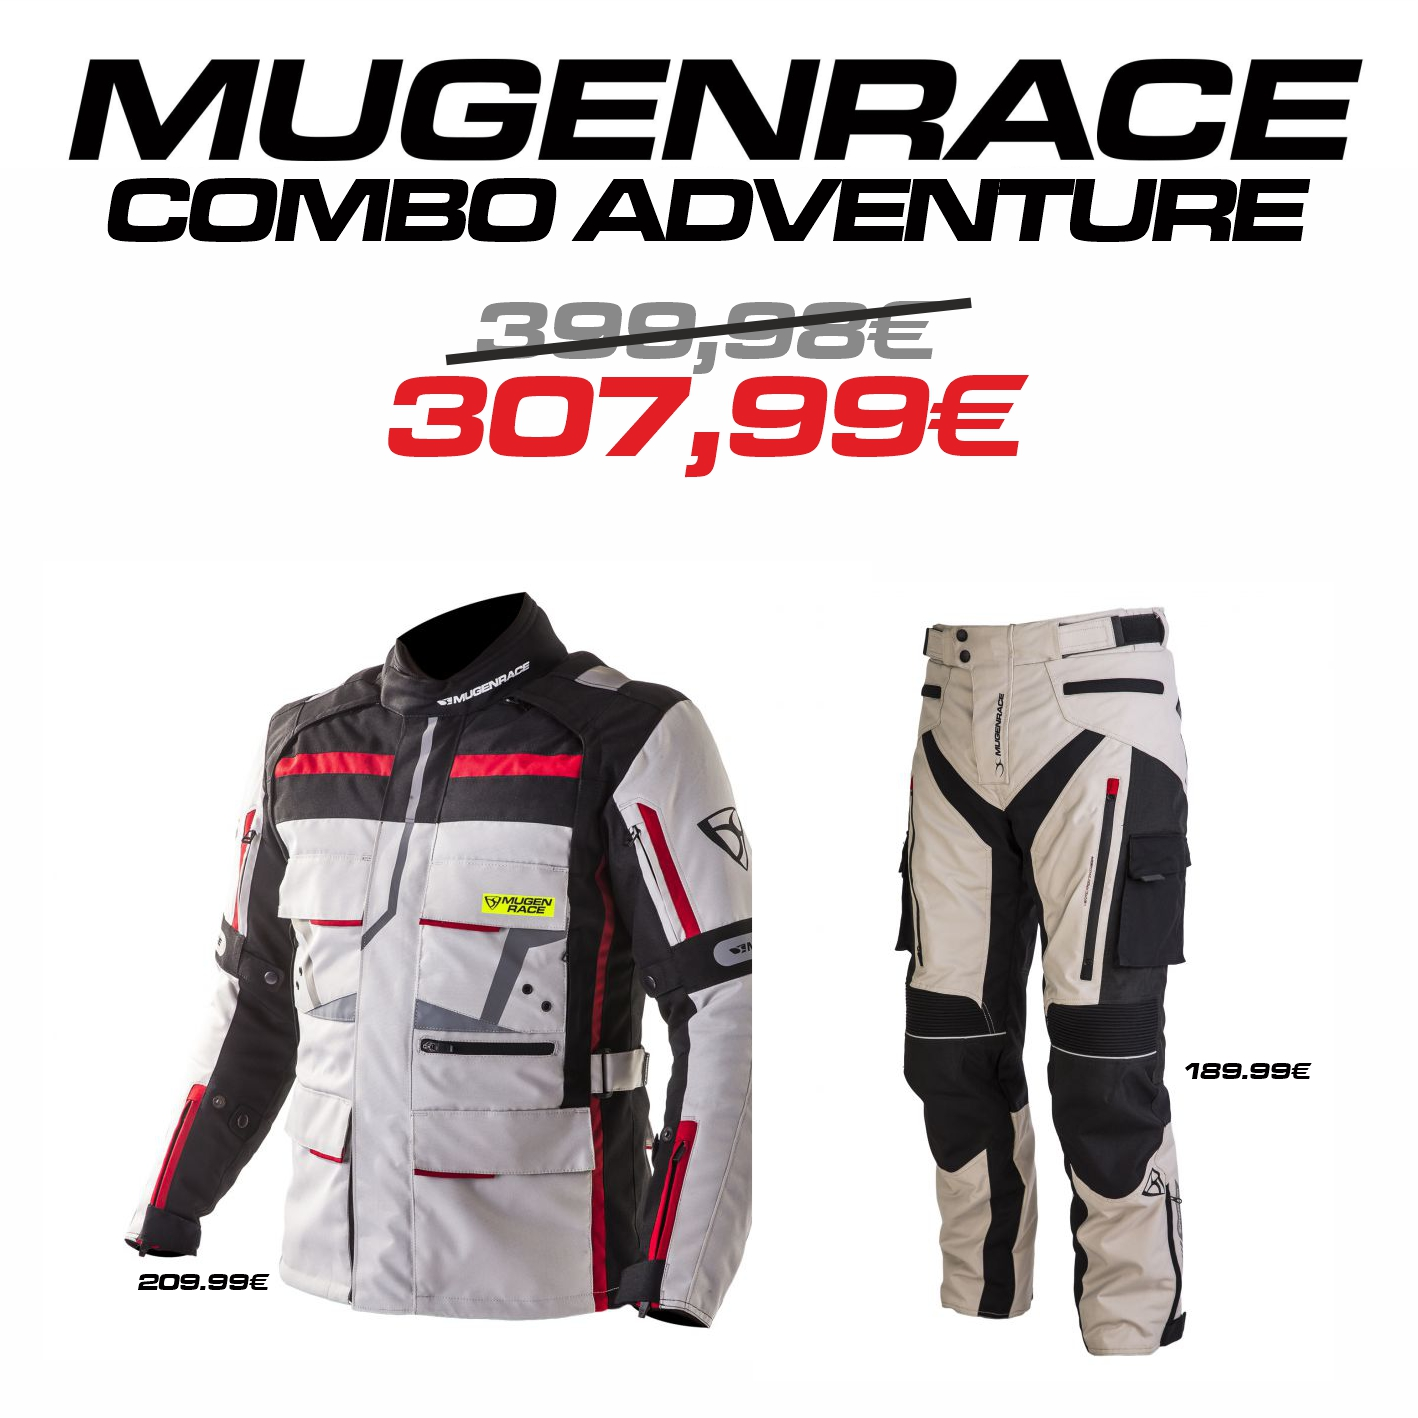 MUGENRACE Combo Adventure (man)